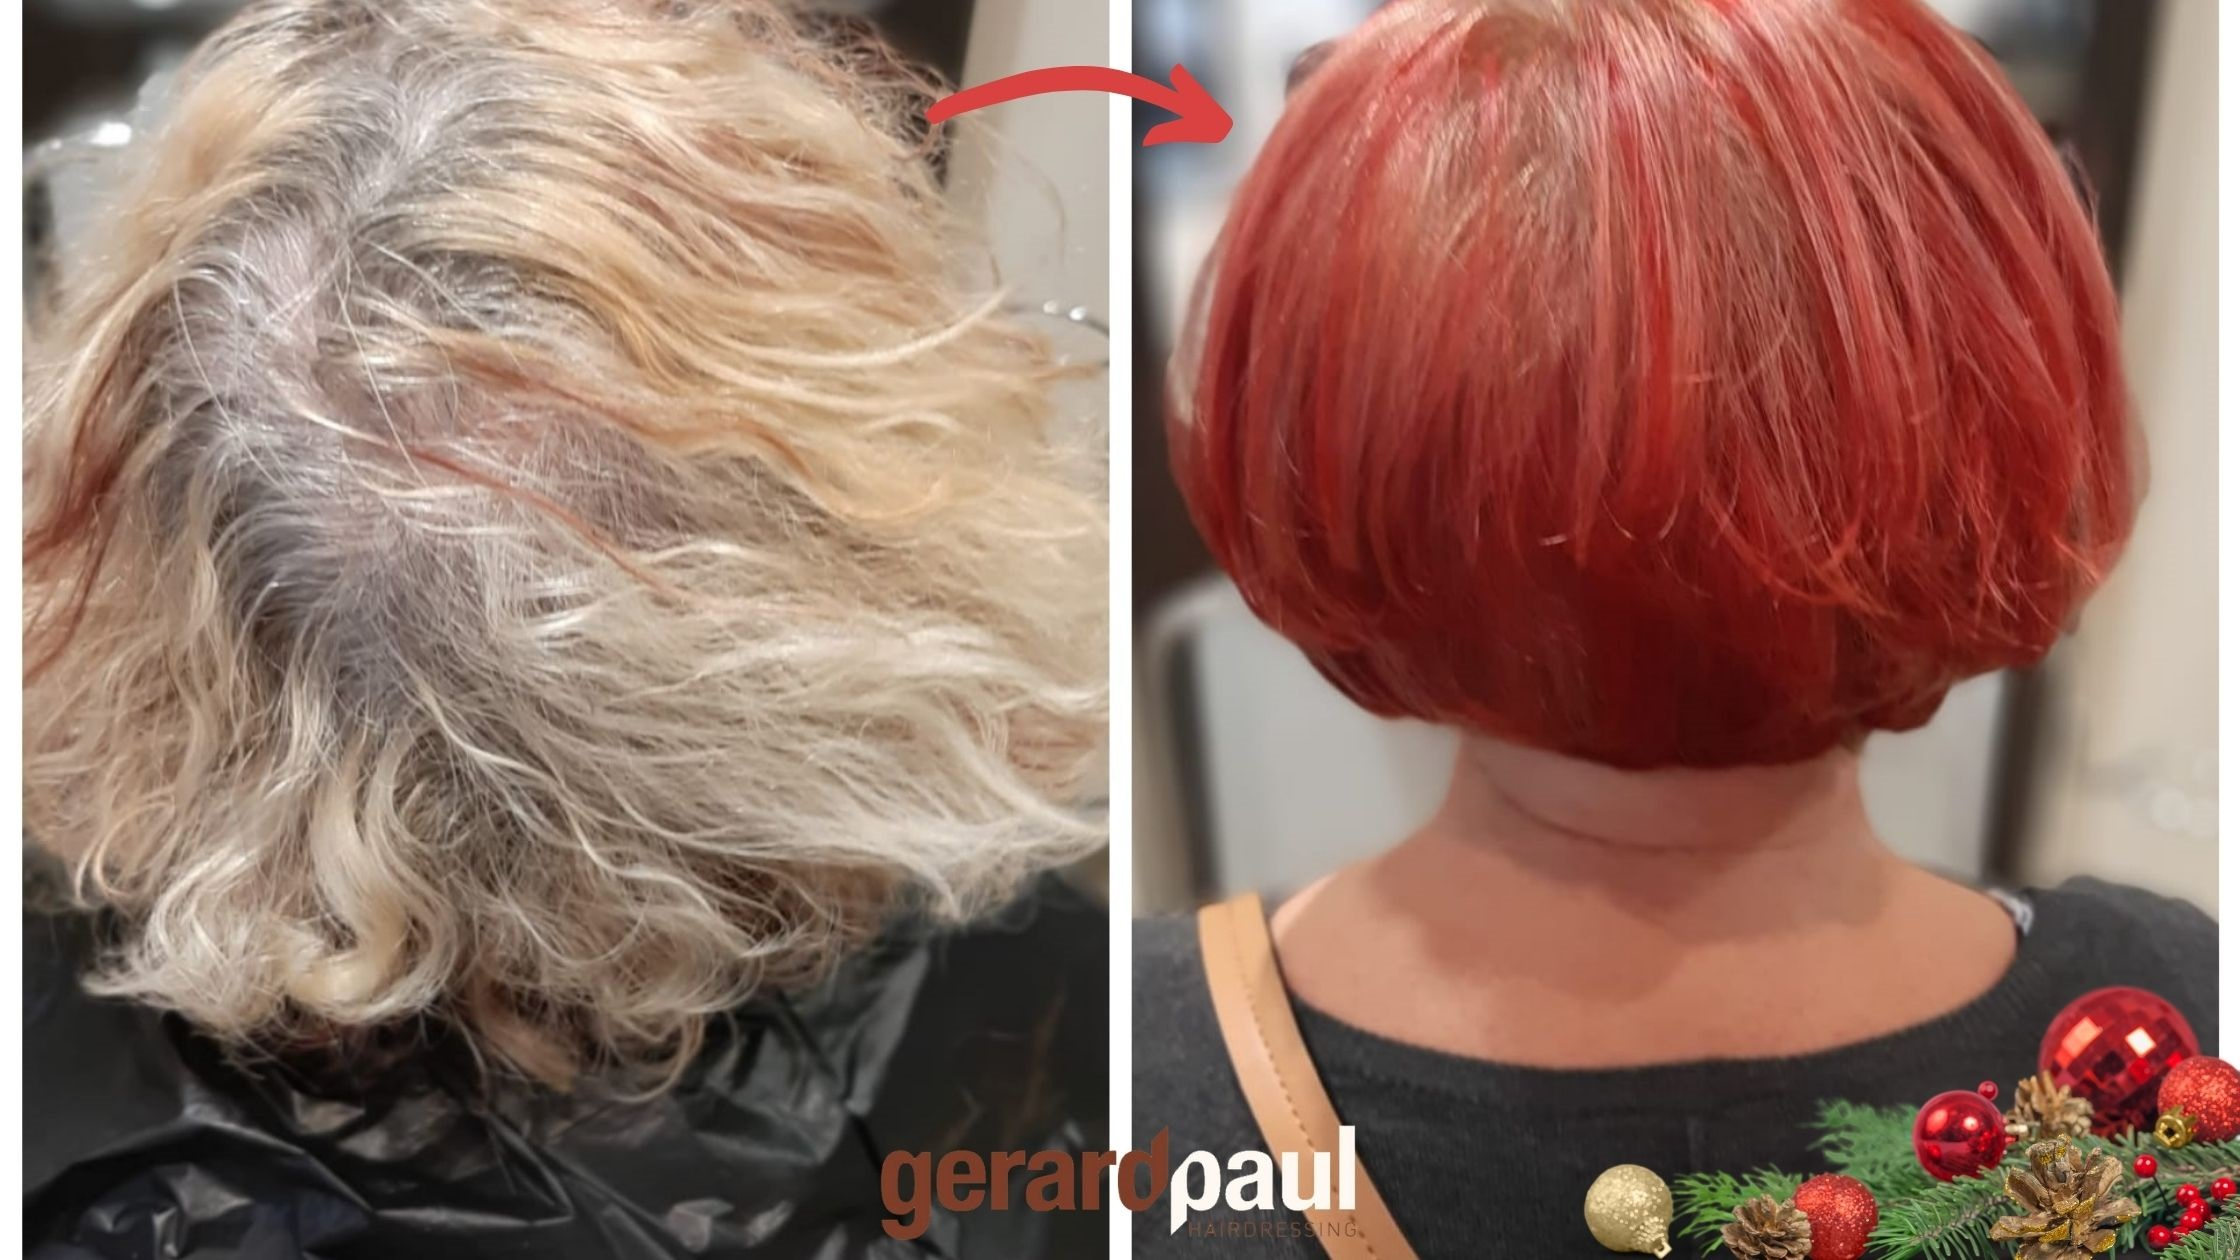 Gerard Paul Hair Dublin hair restyle